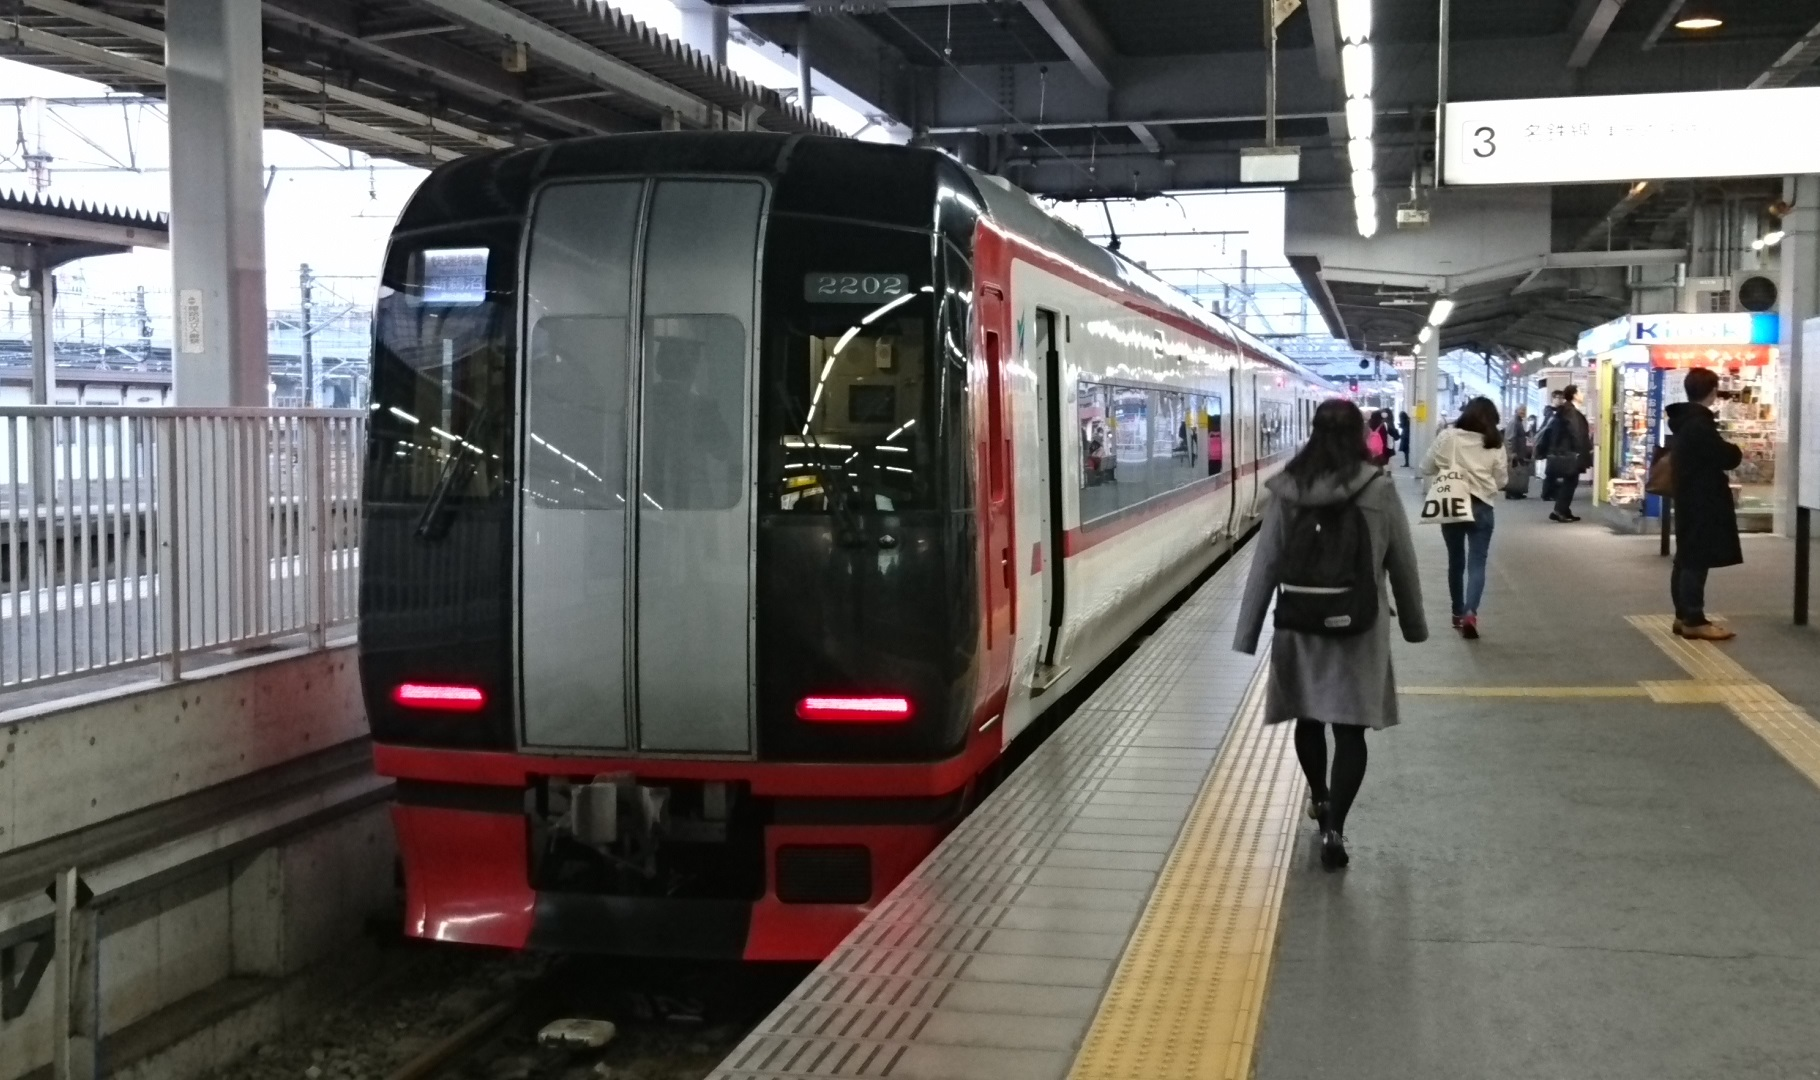 2016.12.9 (1) 豊橋 - 新鵜沼いき快速特急(2202)